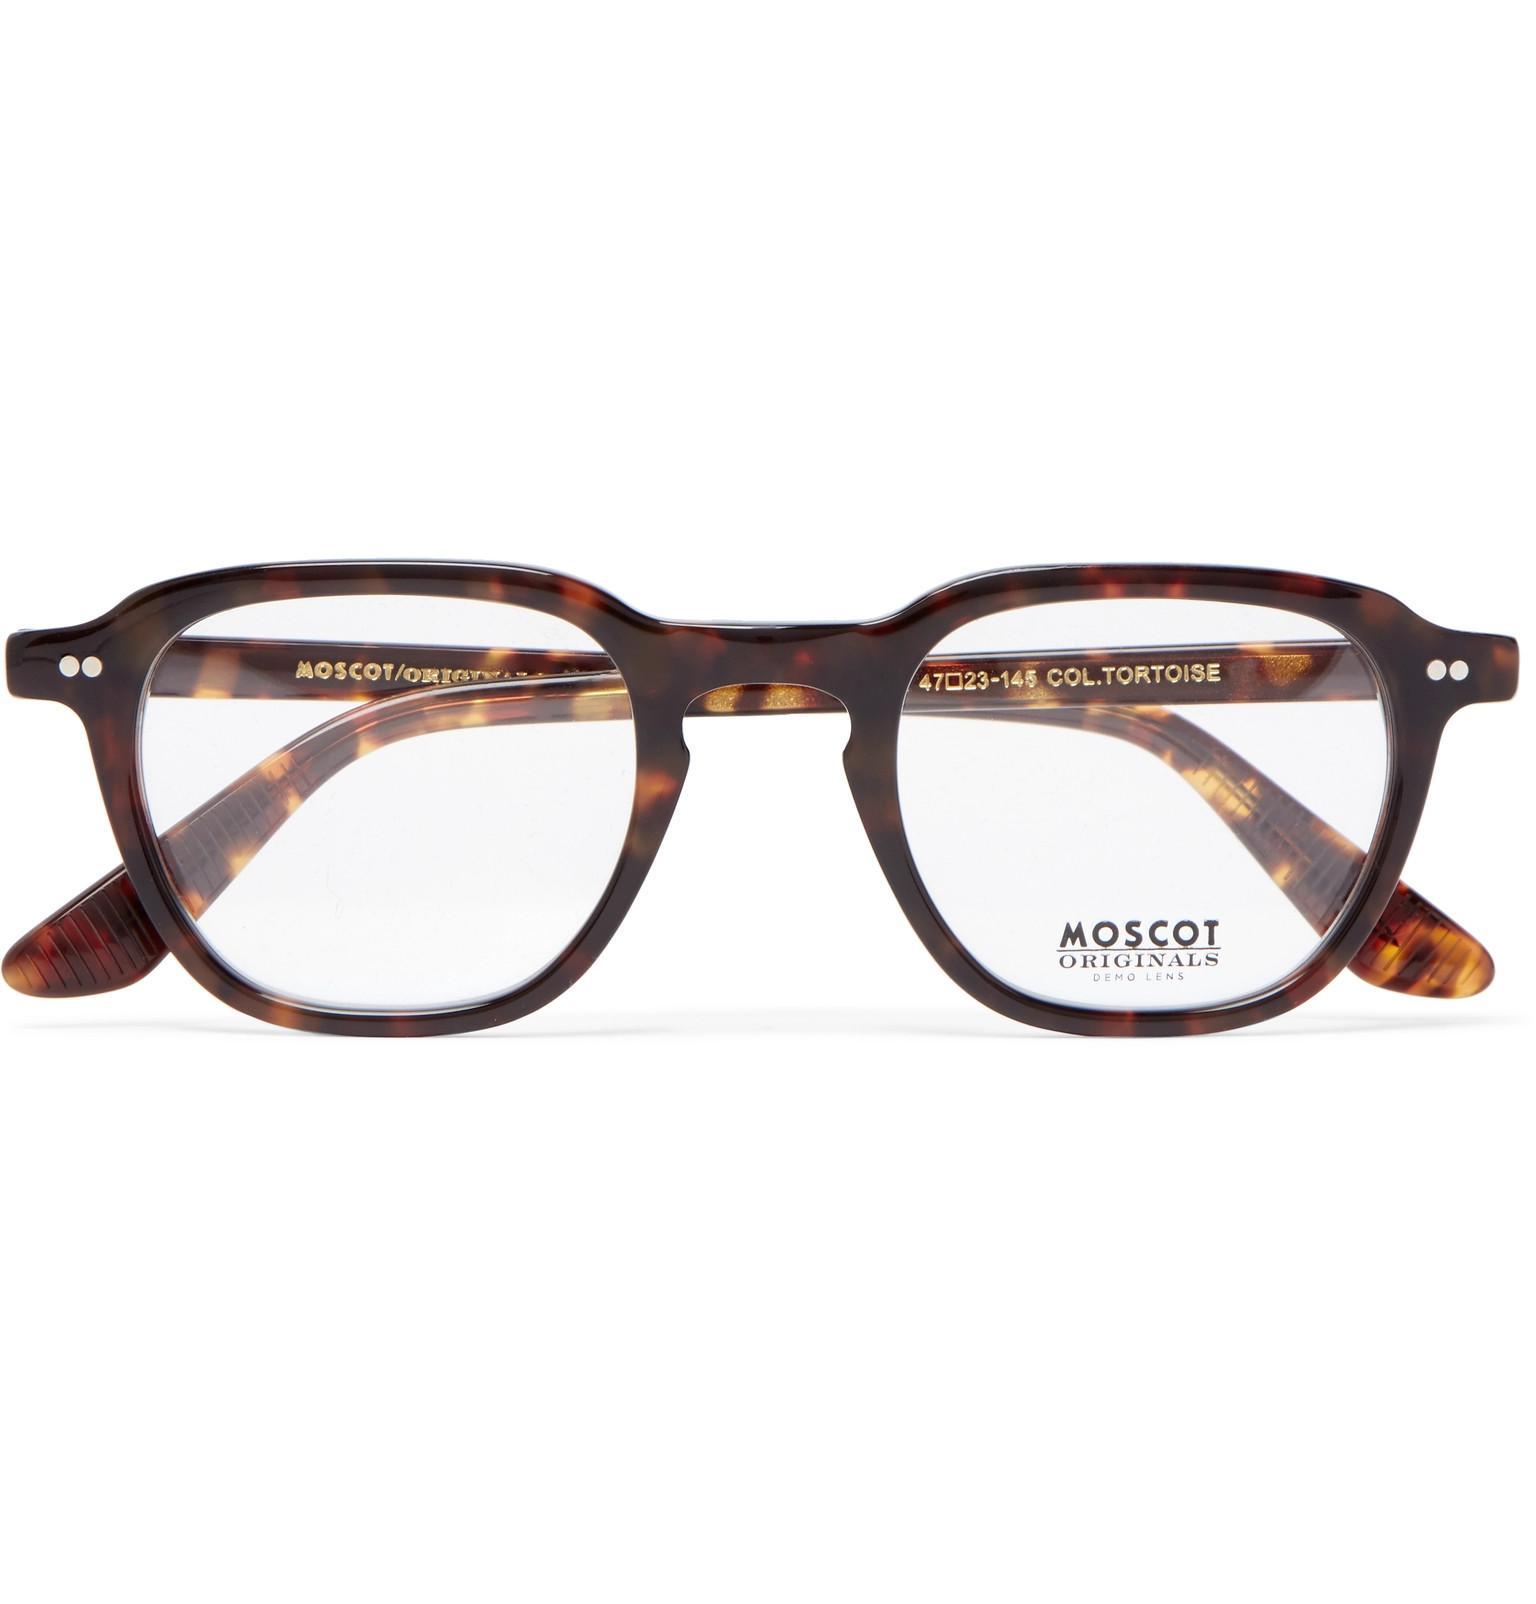 096986aadc40 Moscot Billik Round-frame Tortoiseshell Acetate Optical Glasses in ...